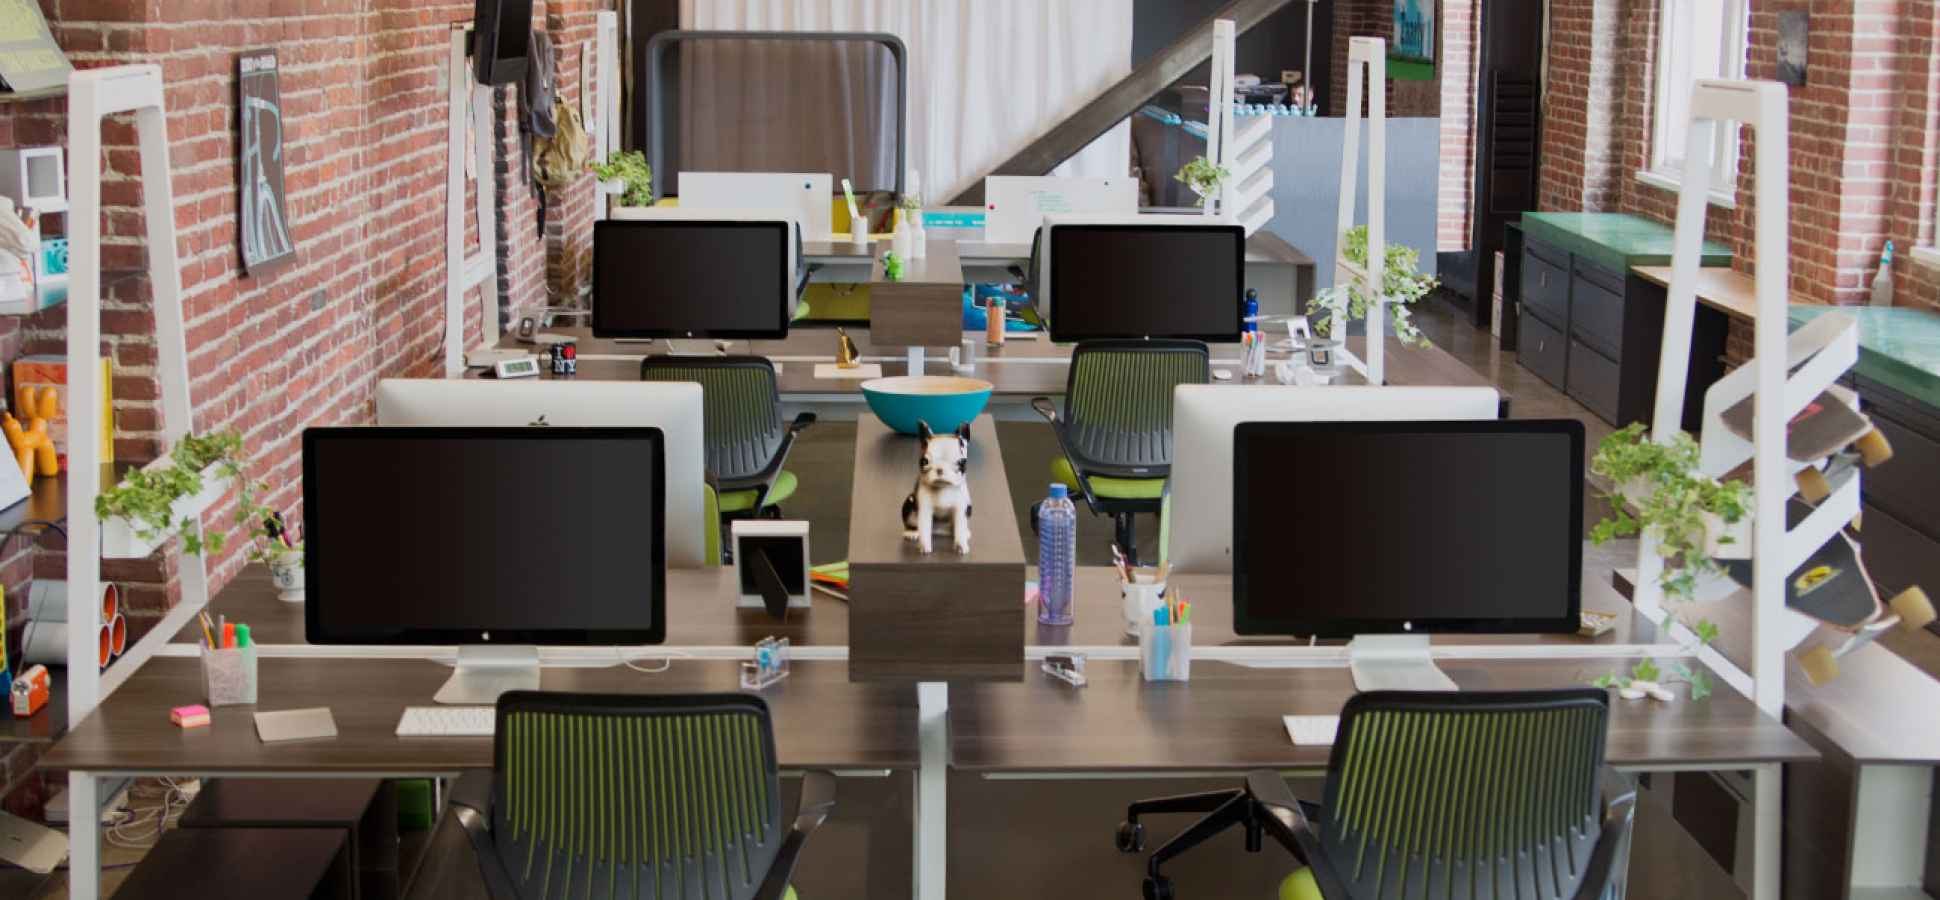 10 office design tips to foster creativity inccom innovative office ideas